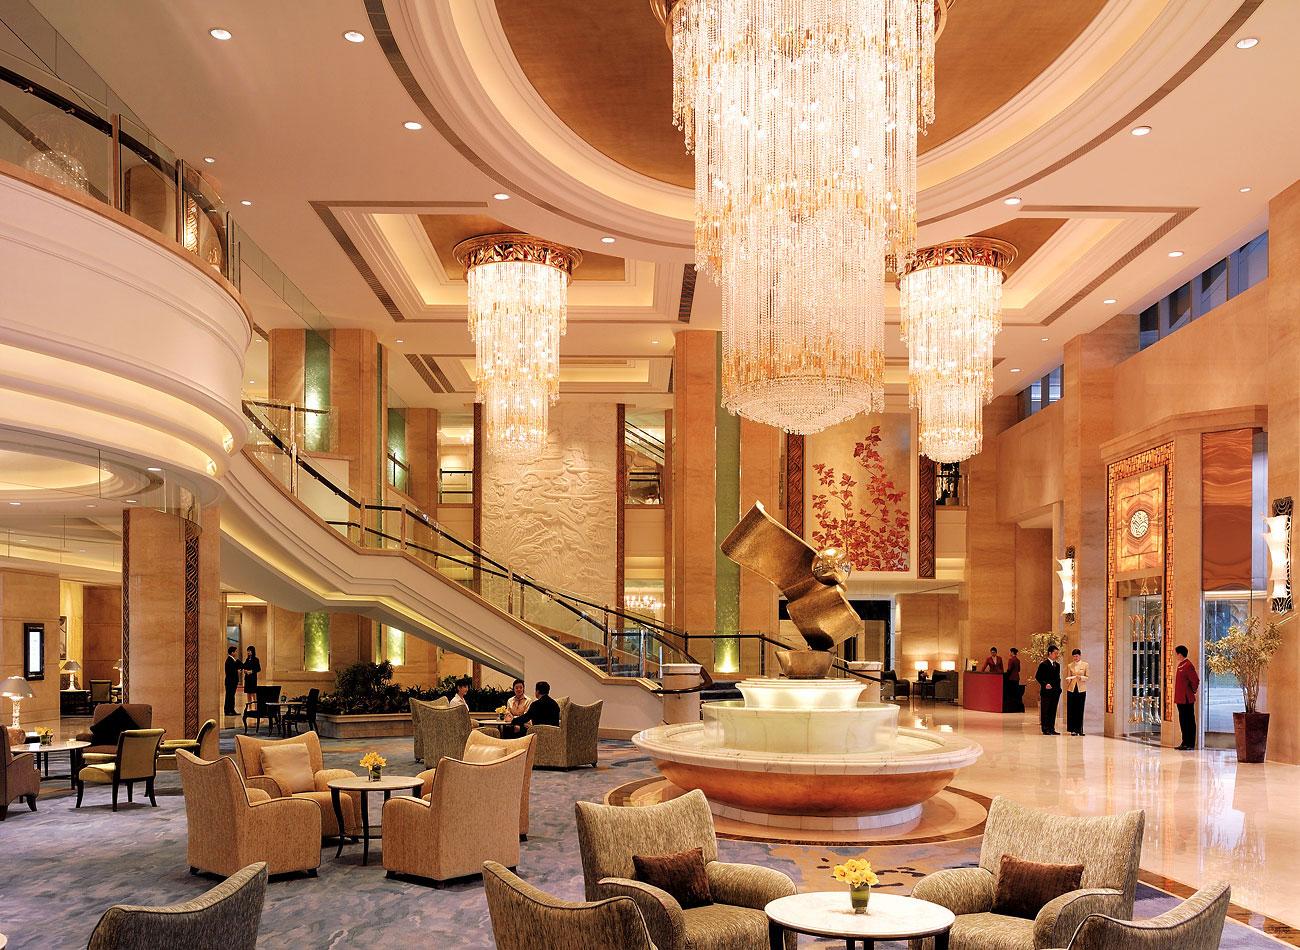 Recrutement et formation en hotellerie yaounde for Hotel chercher